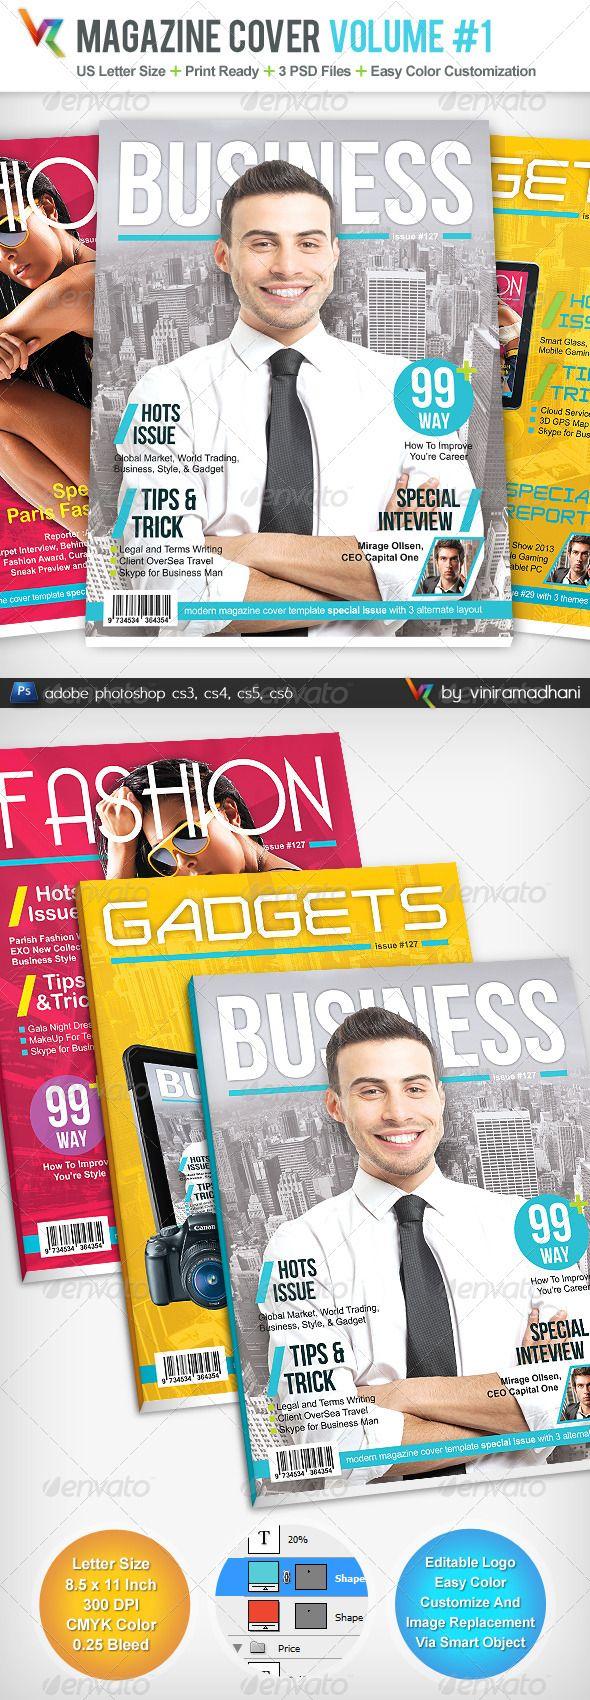 Magazine Cover Volume 1